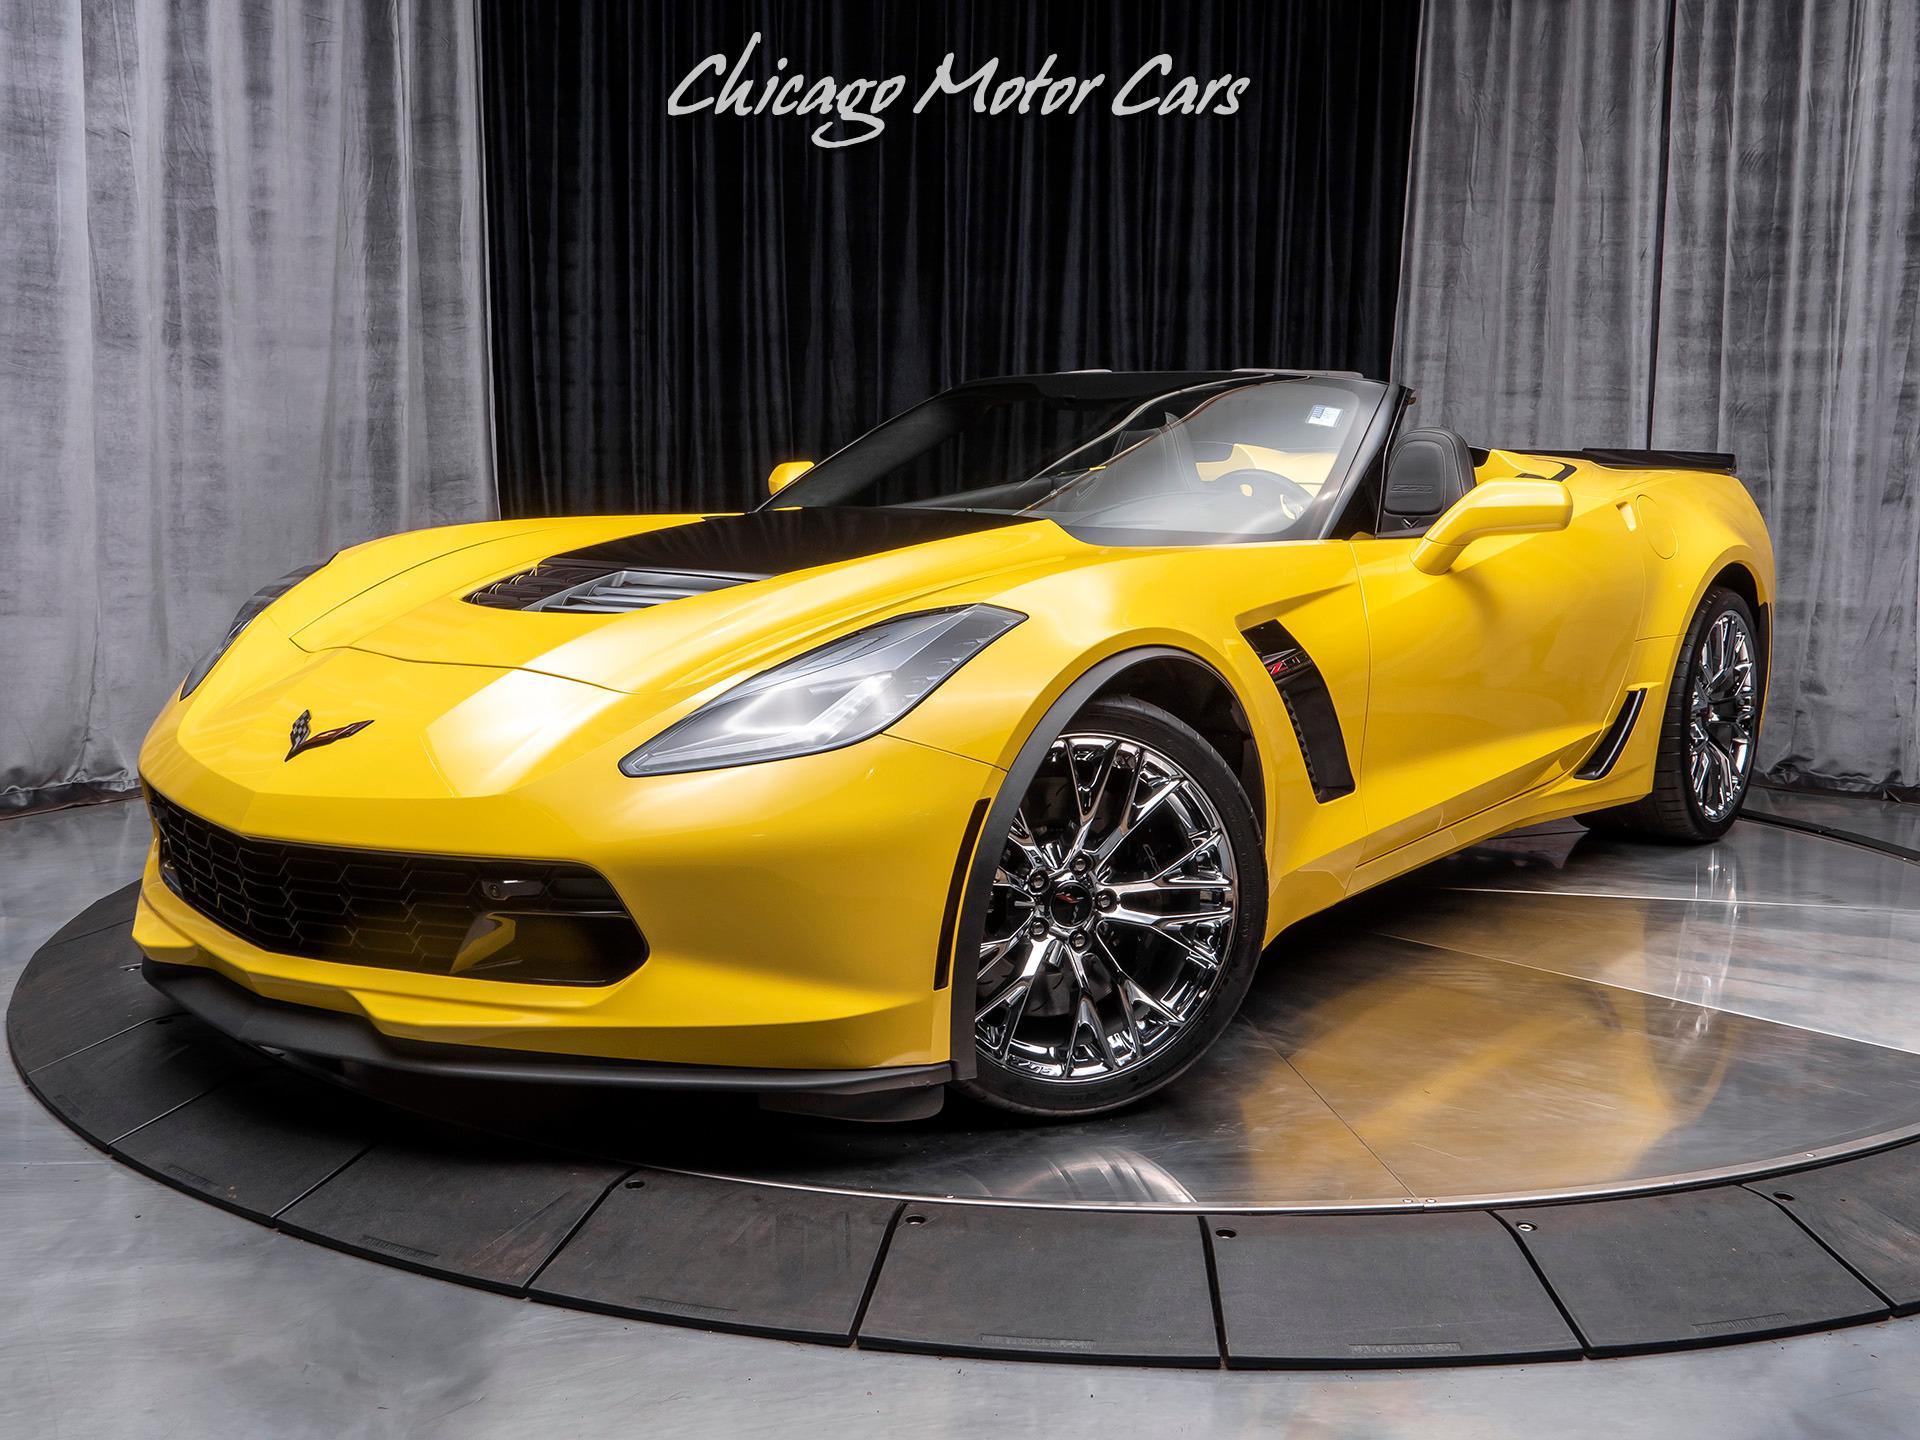 Used 2016 Chevrolet Corvette Z06 3LZ Convertible 8-SPEED